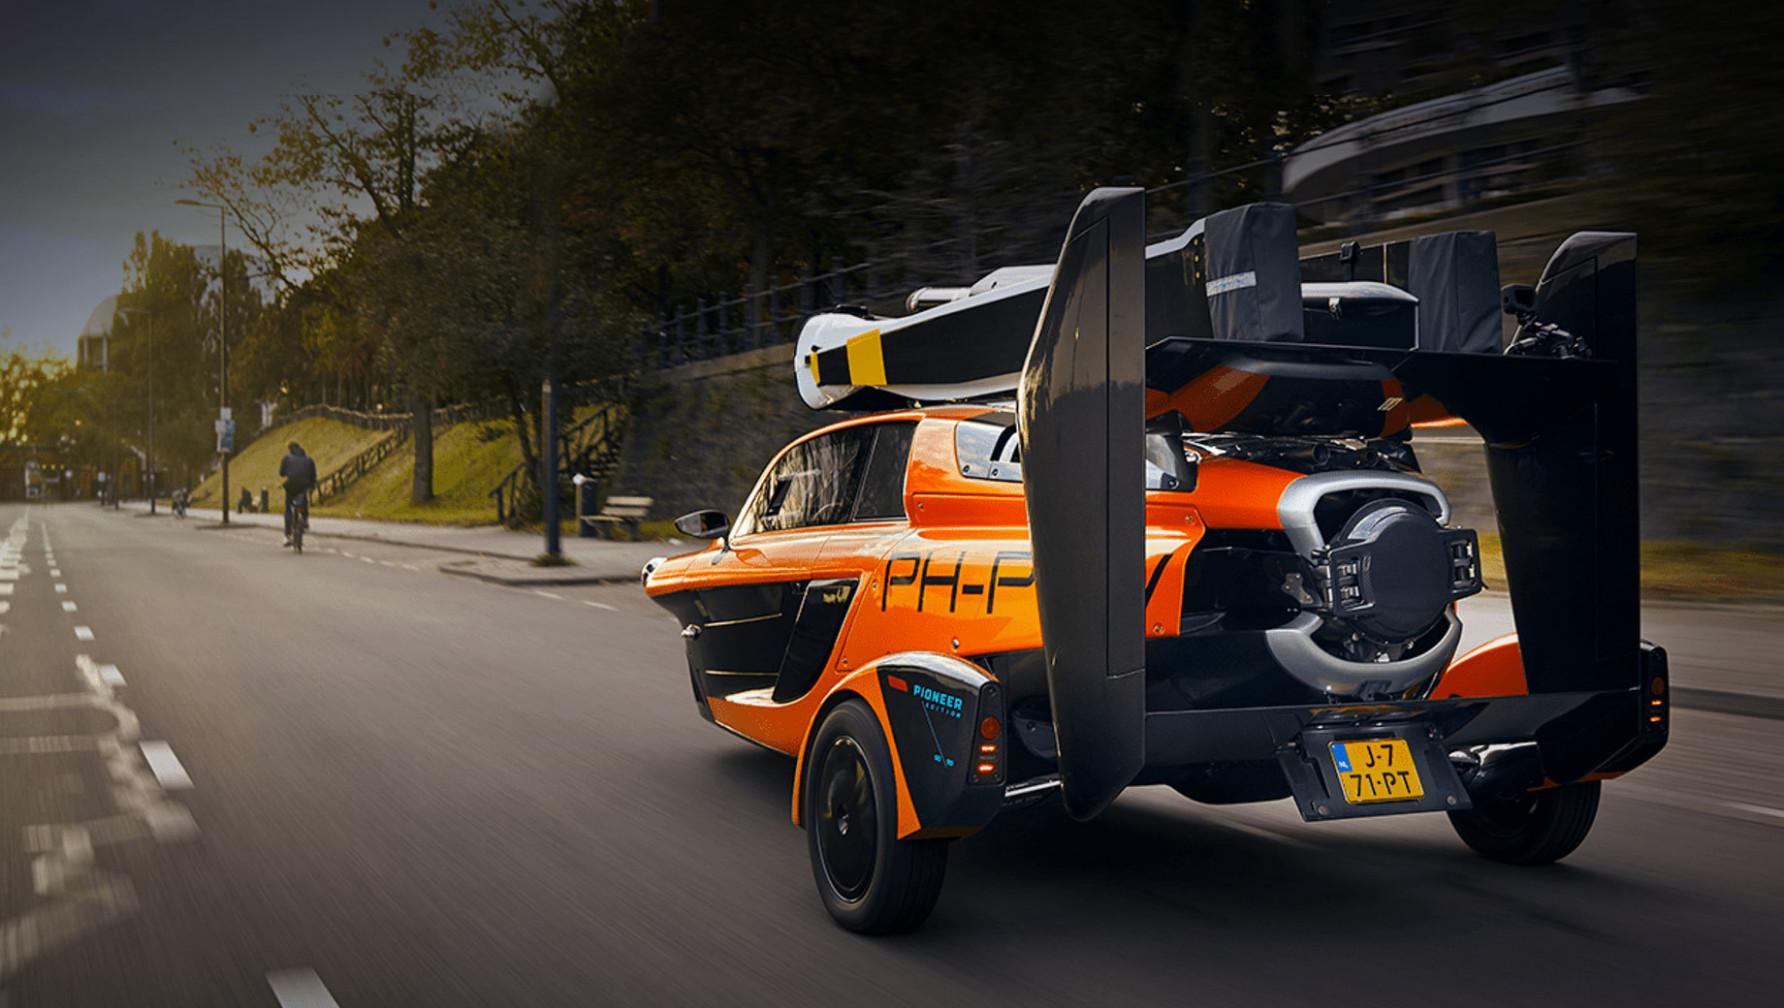 Redesign and Review 2022 Subaru Liberty